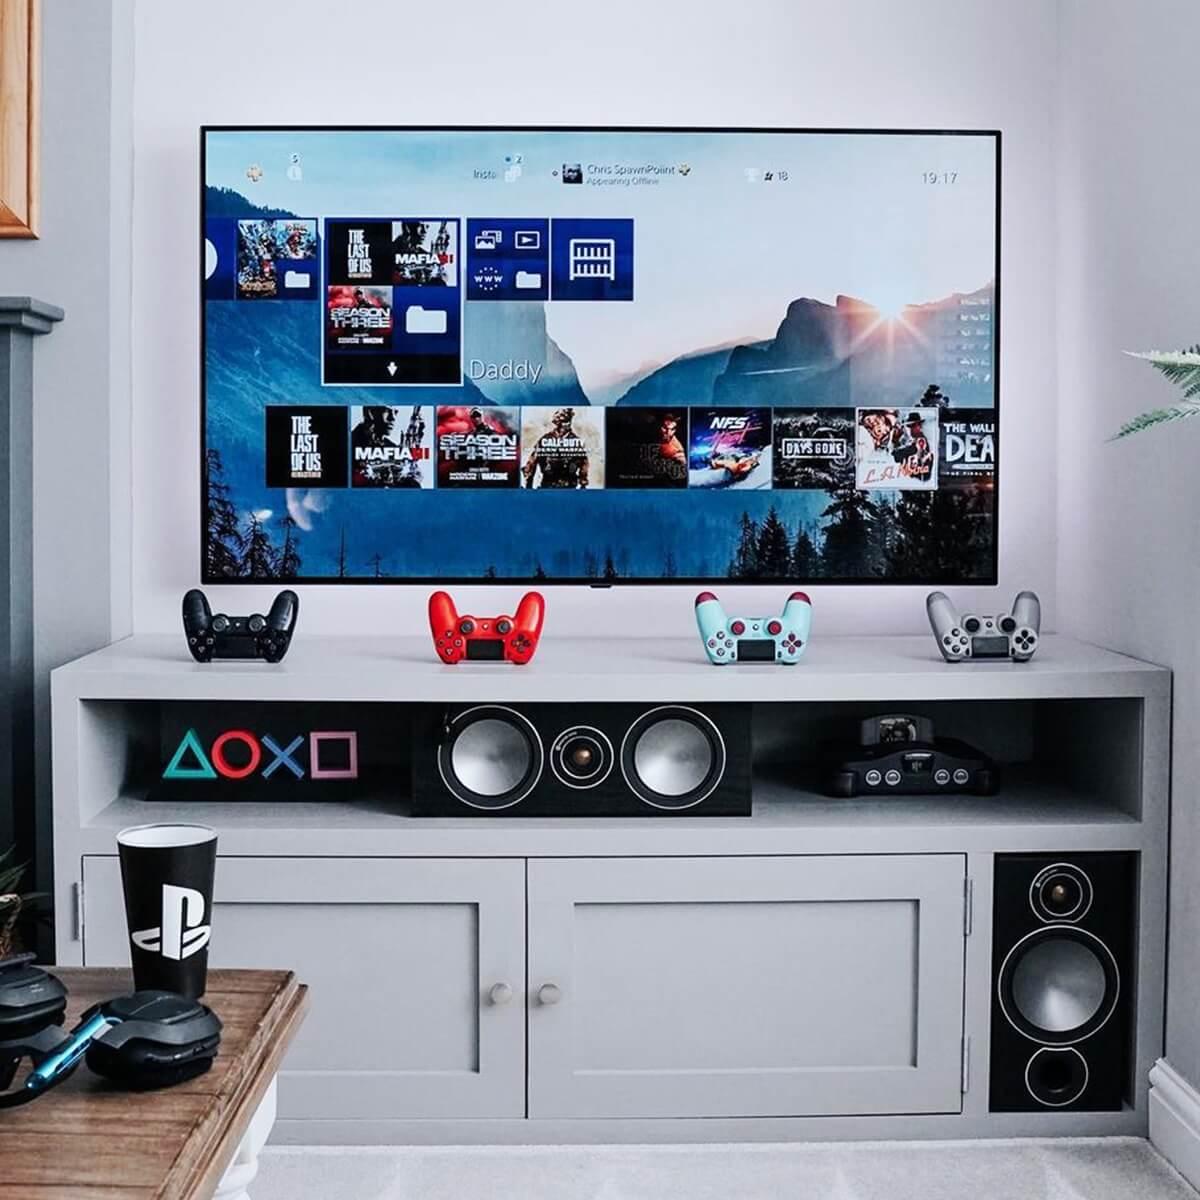 Best TV for Gaming Setup